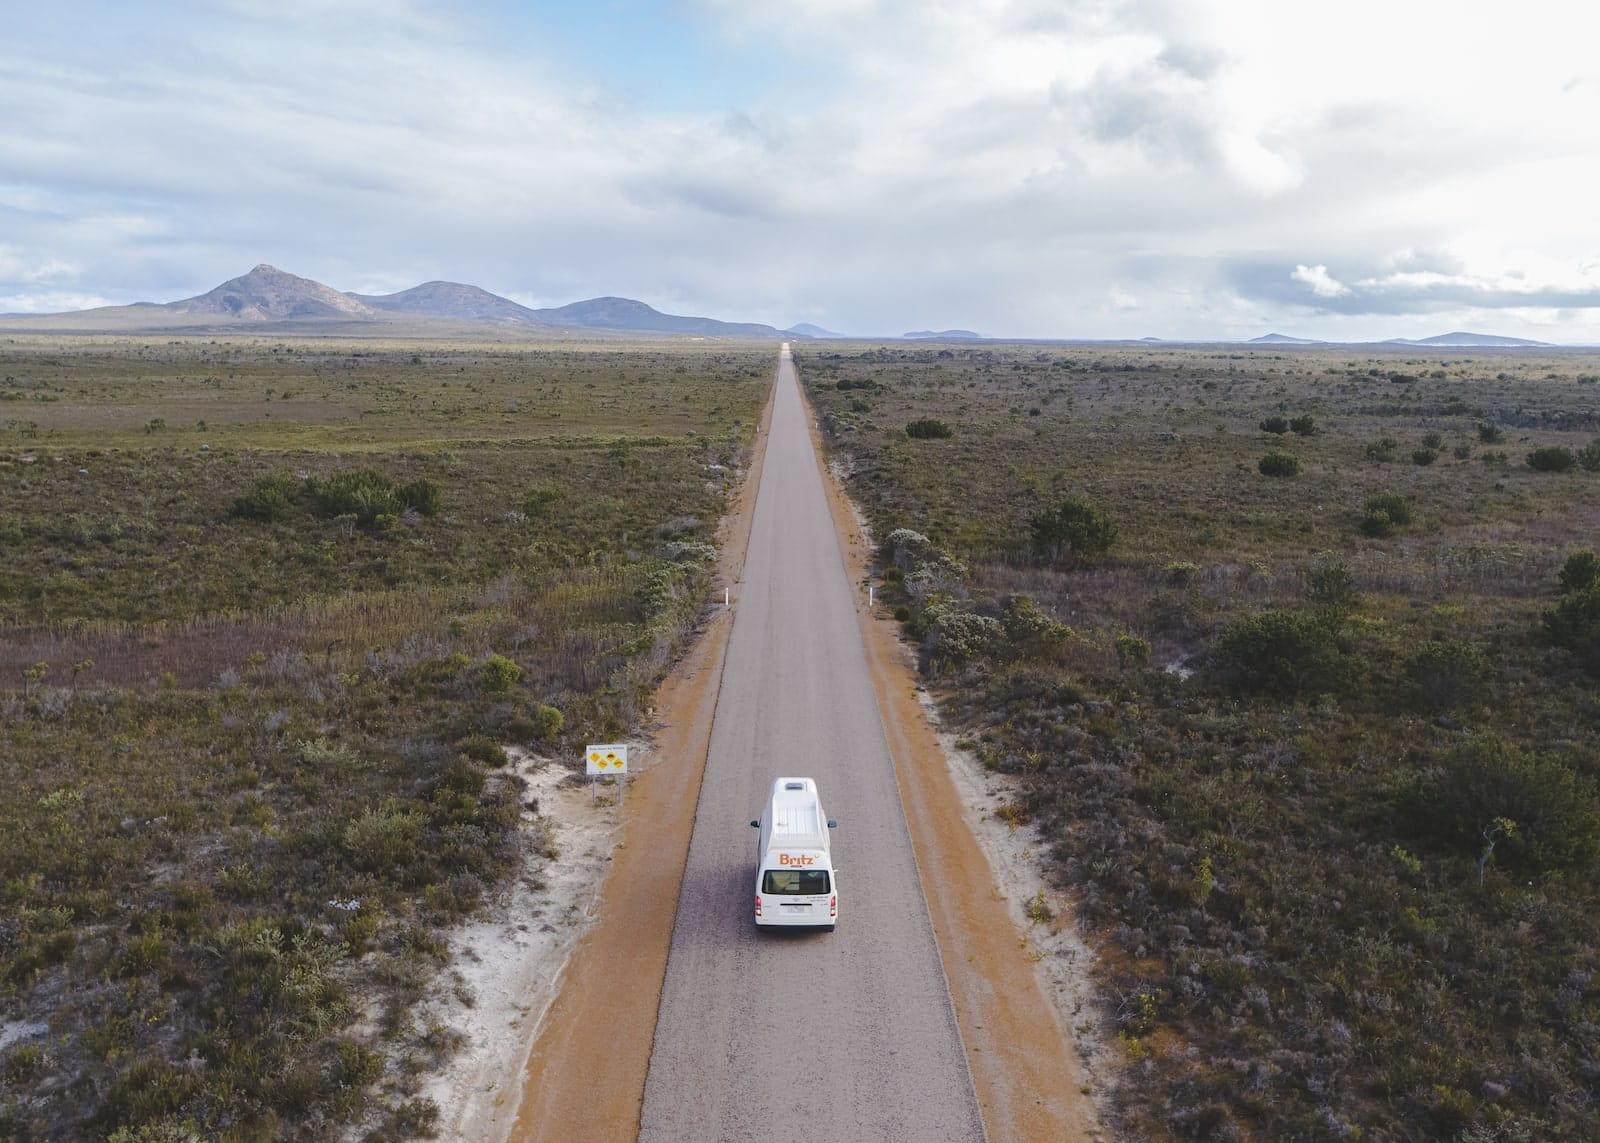 britz campervans western australia cape range esperance